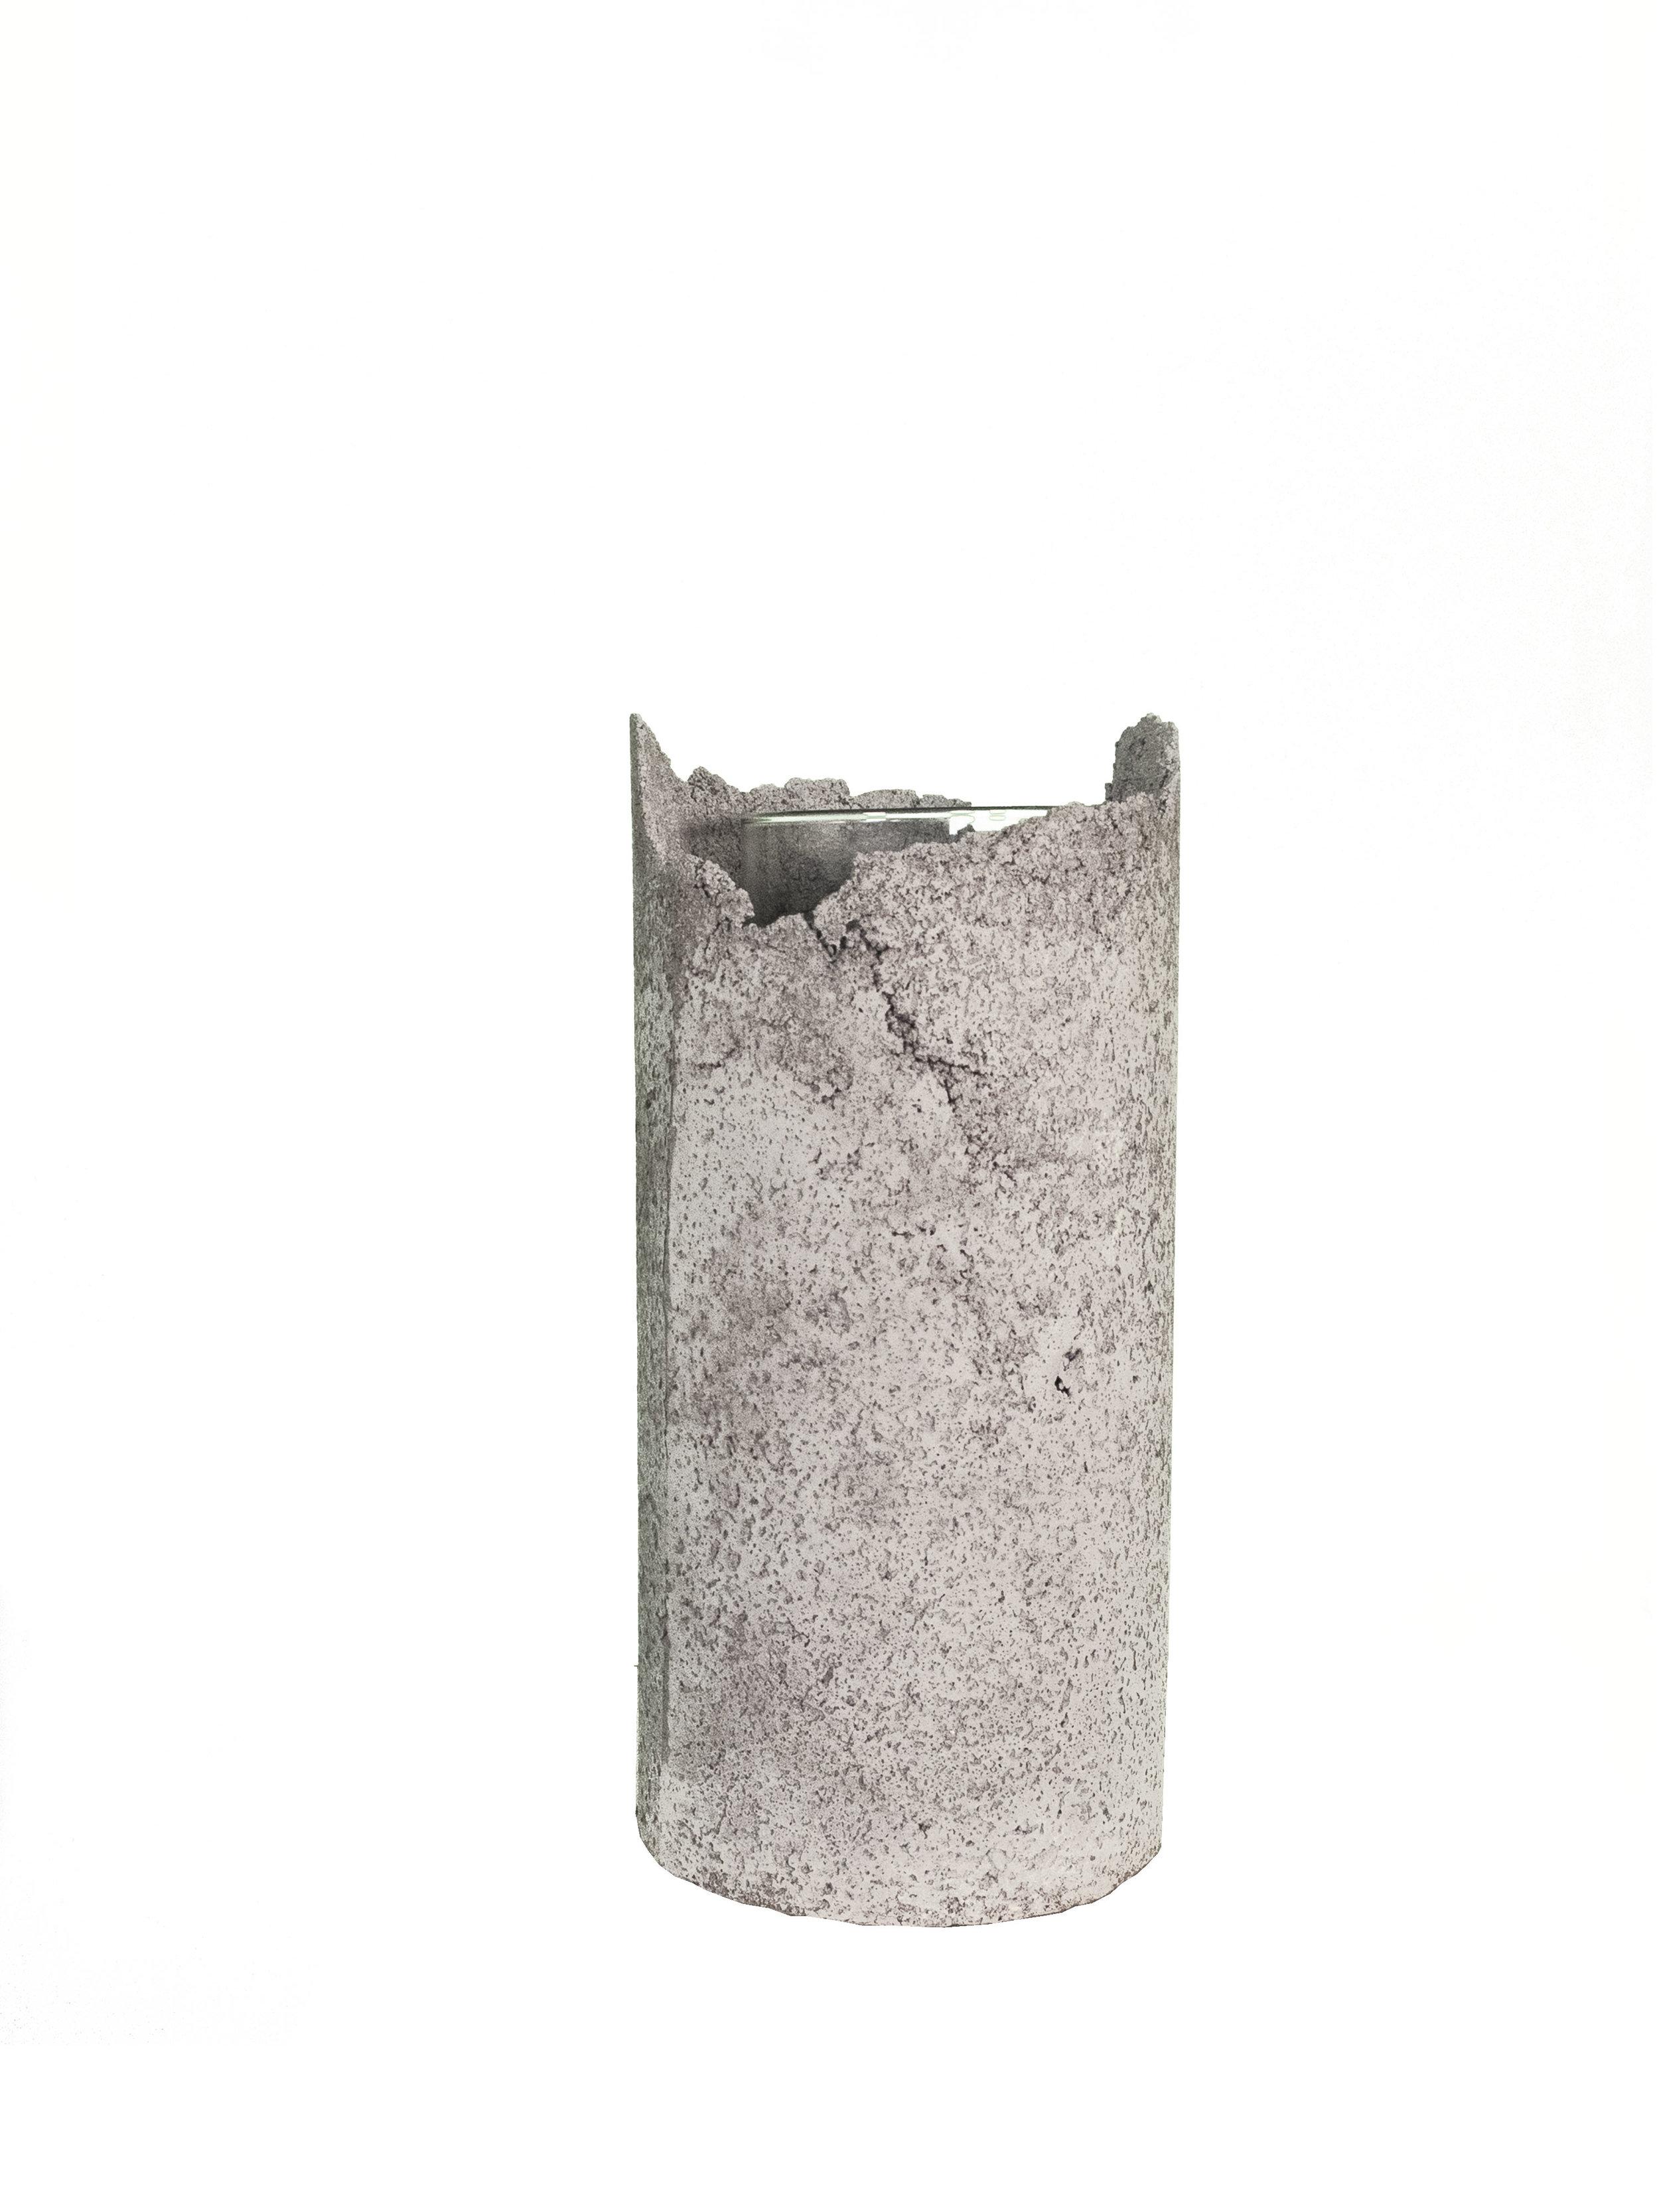 FULO Concrete vase - bare necessities